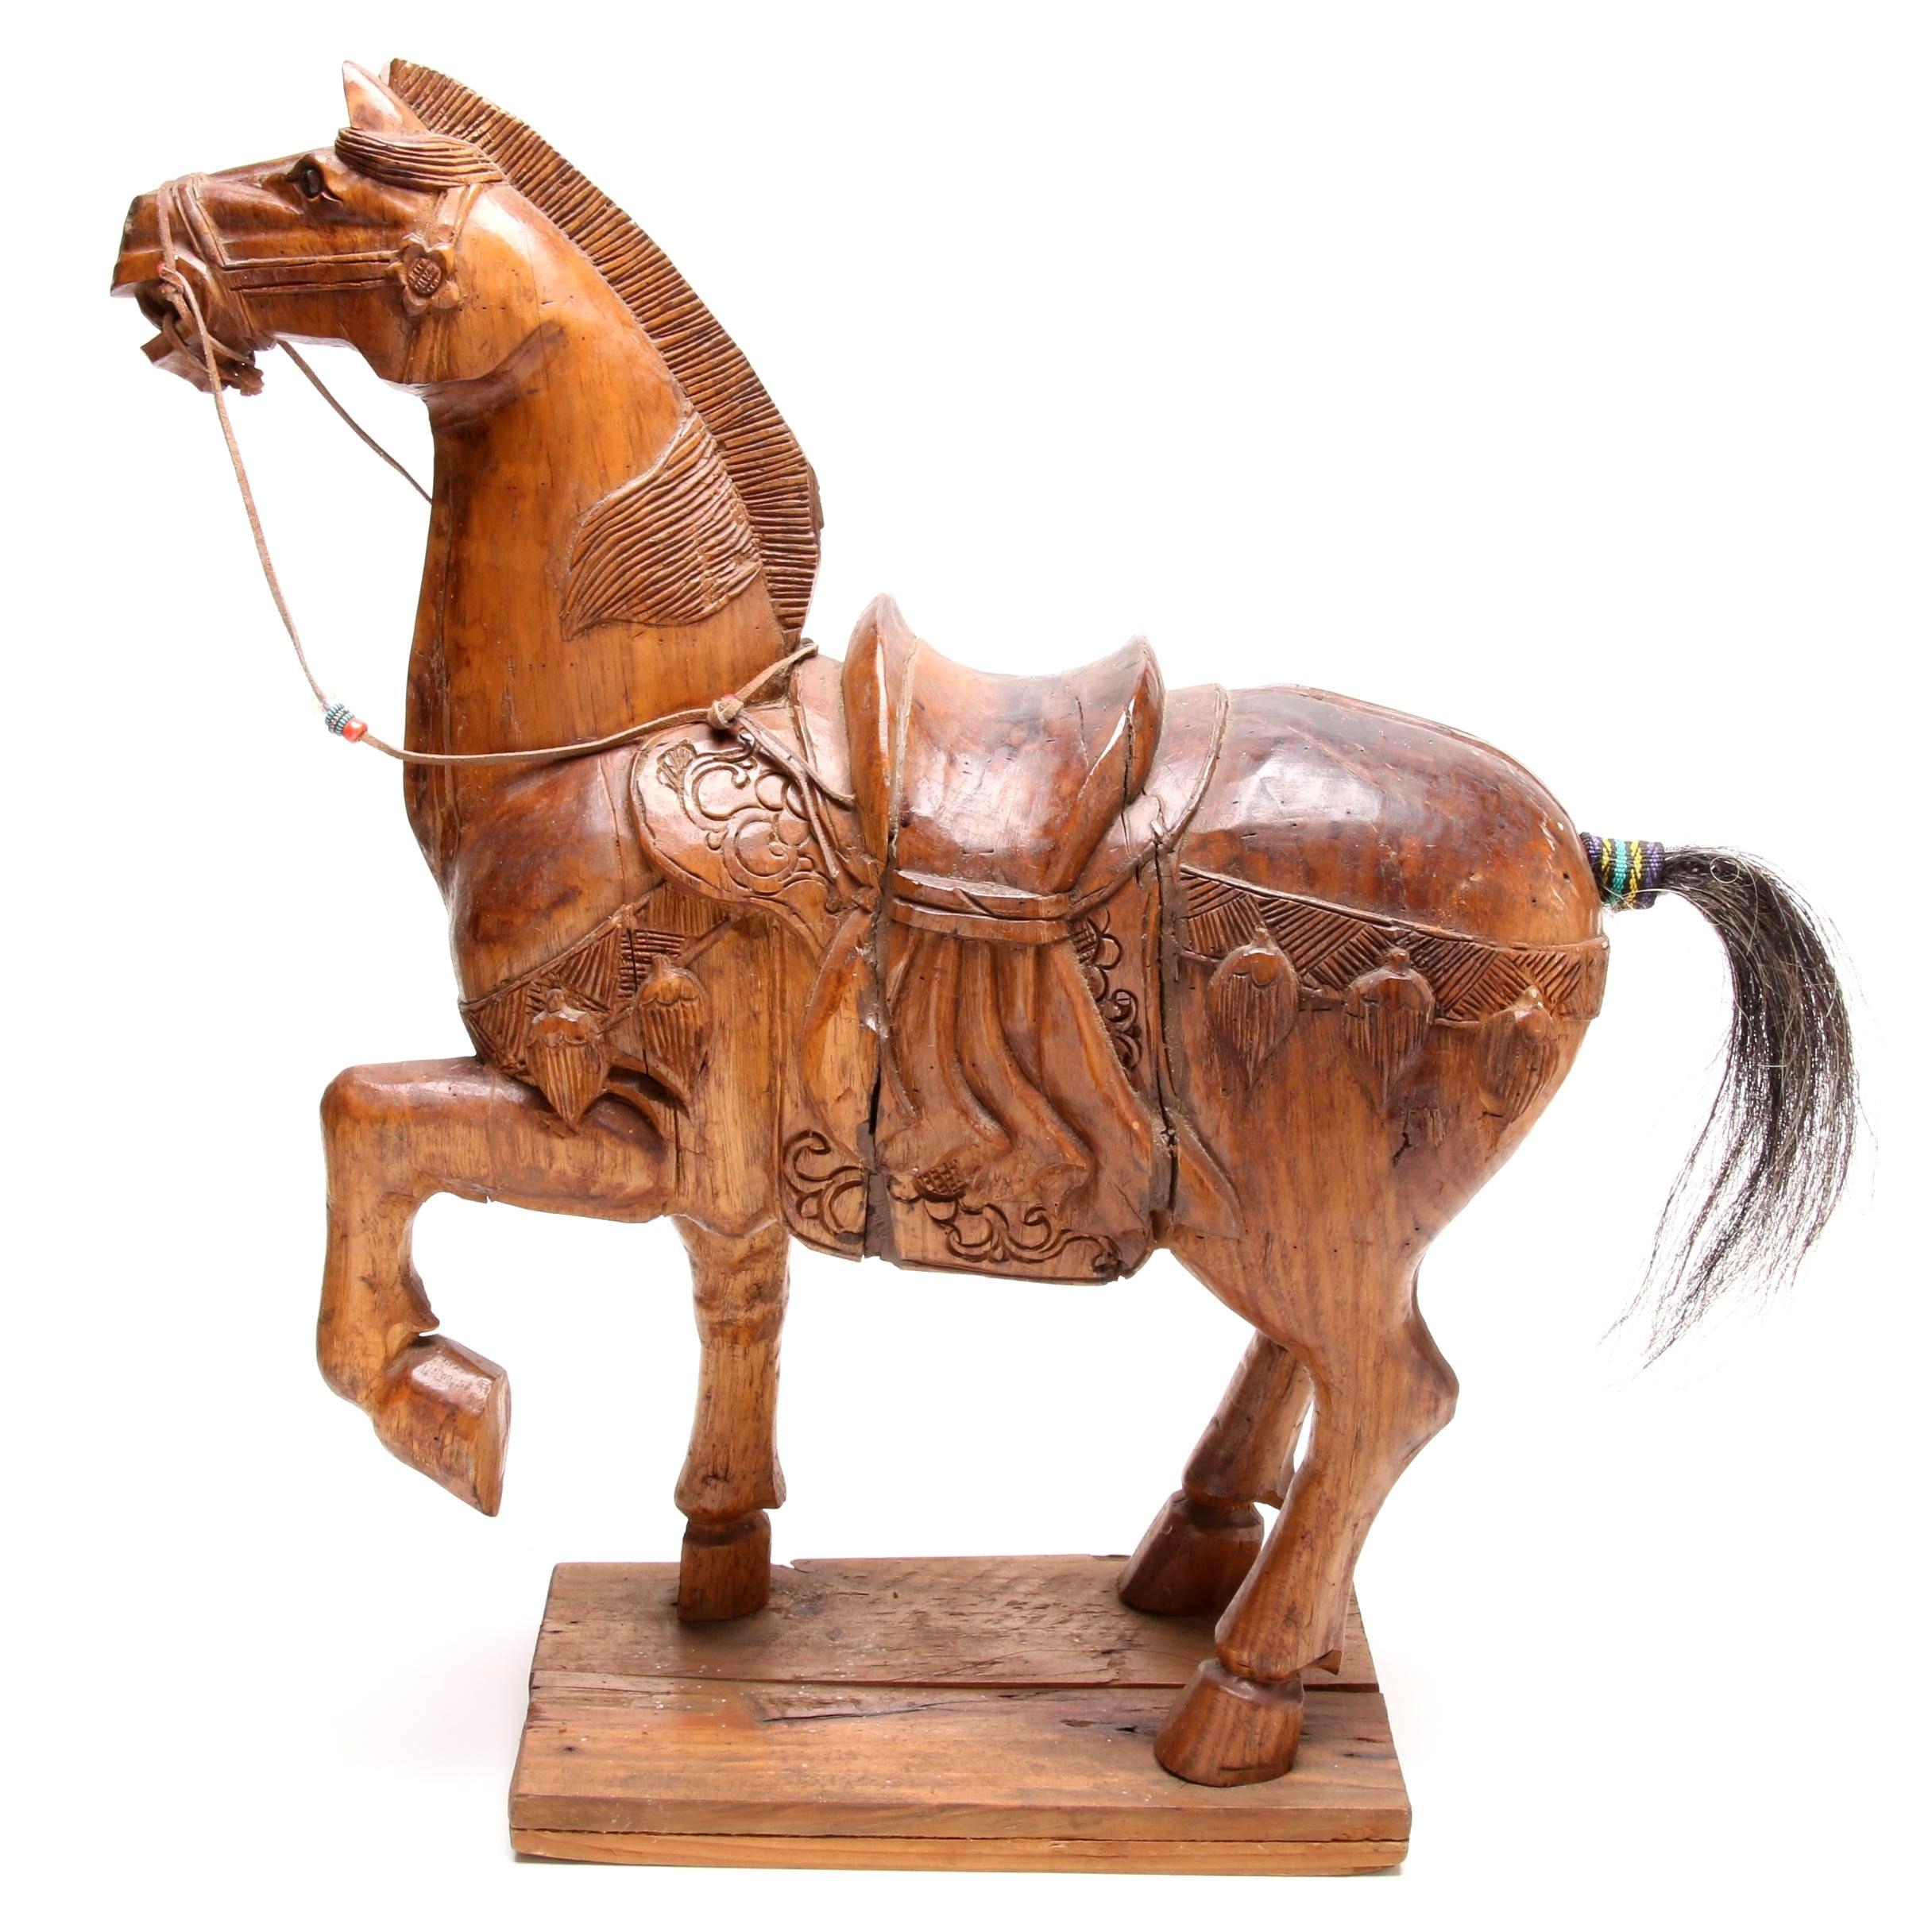 Carved Wood Horse Sculpture